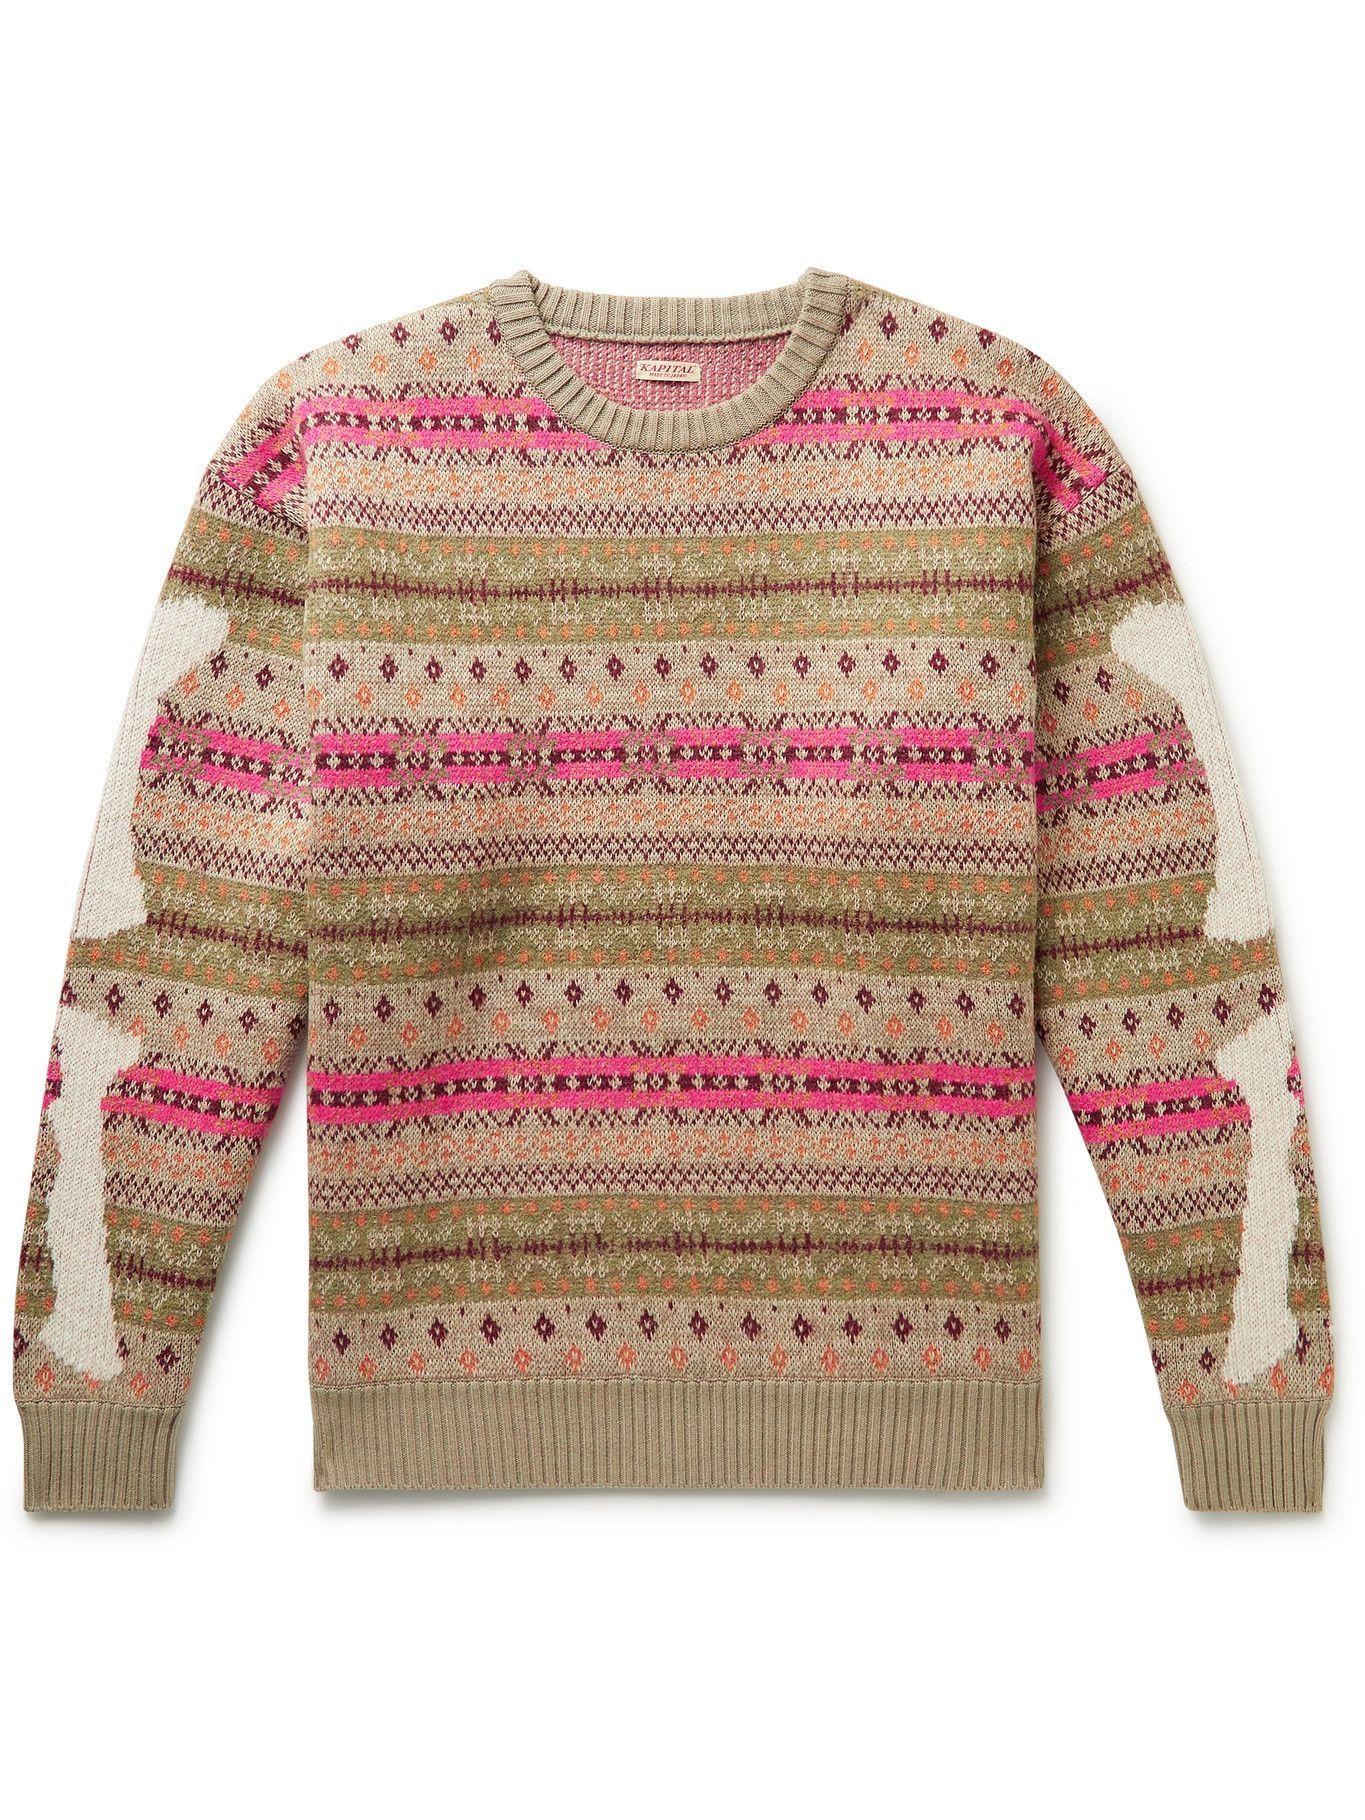 Photo: KAPITAL - Intarsia Fair Isle Wool-Blend Sweater - Neutrals